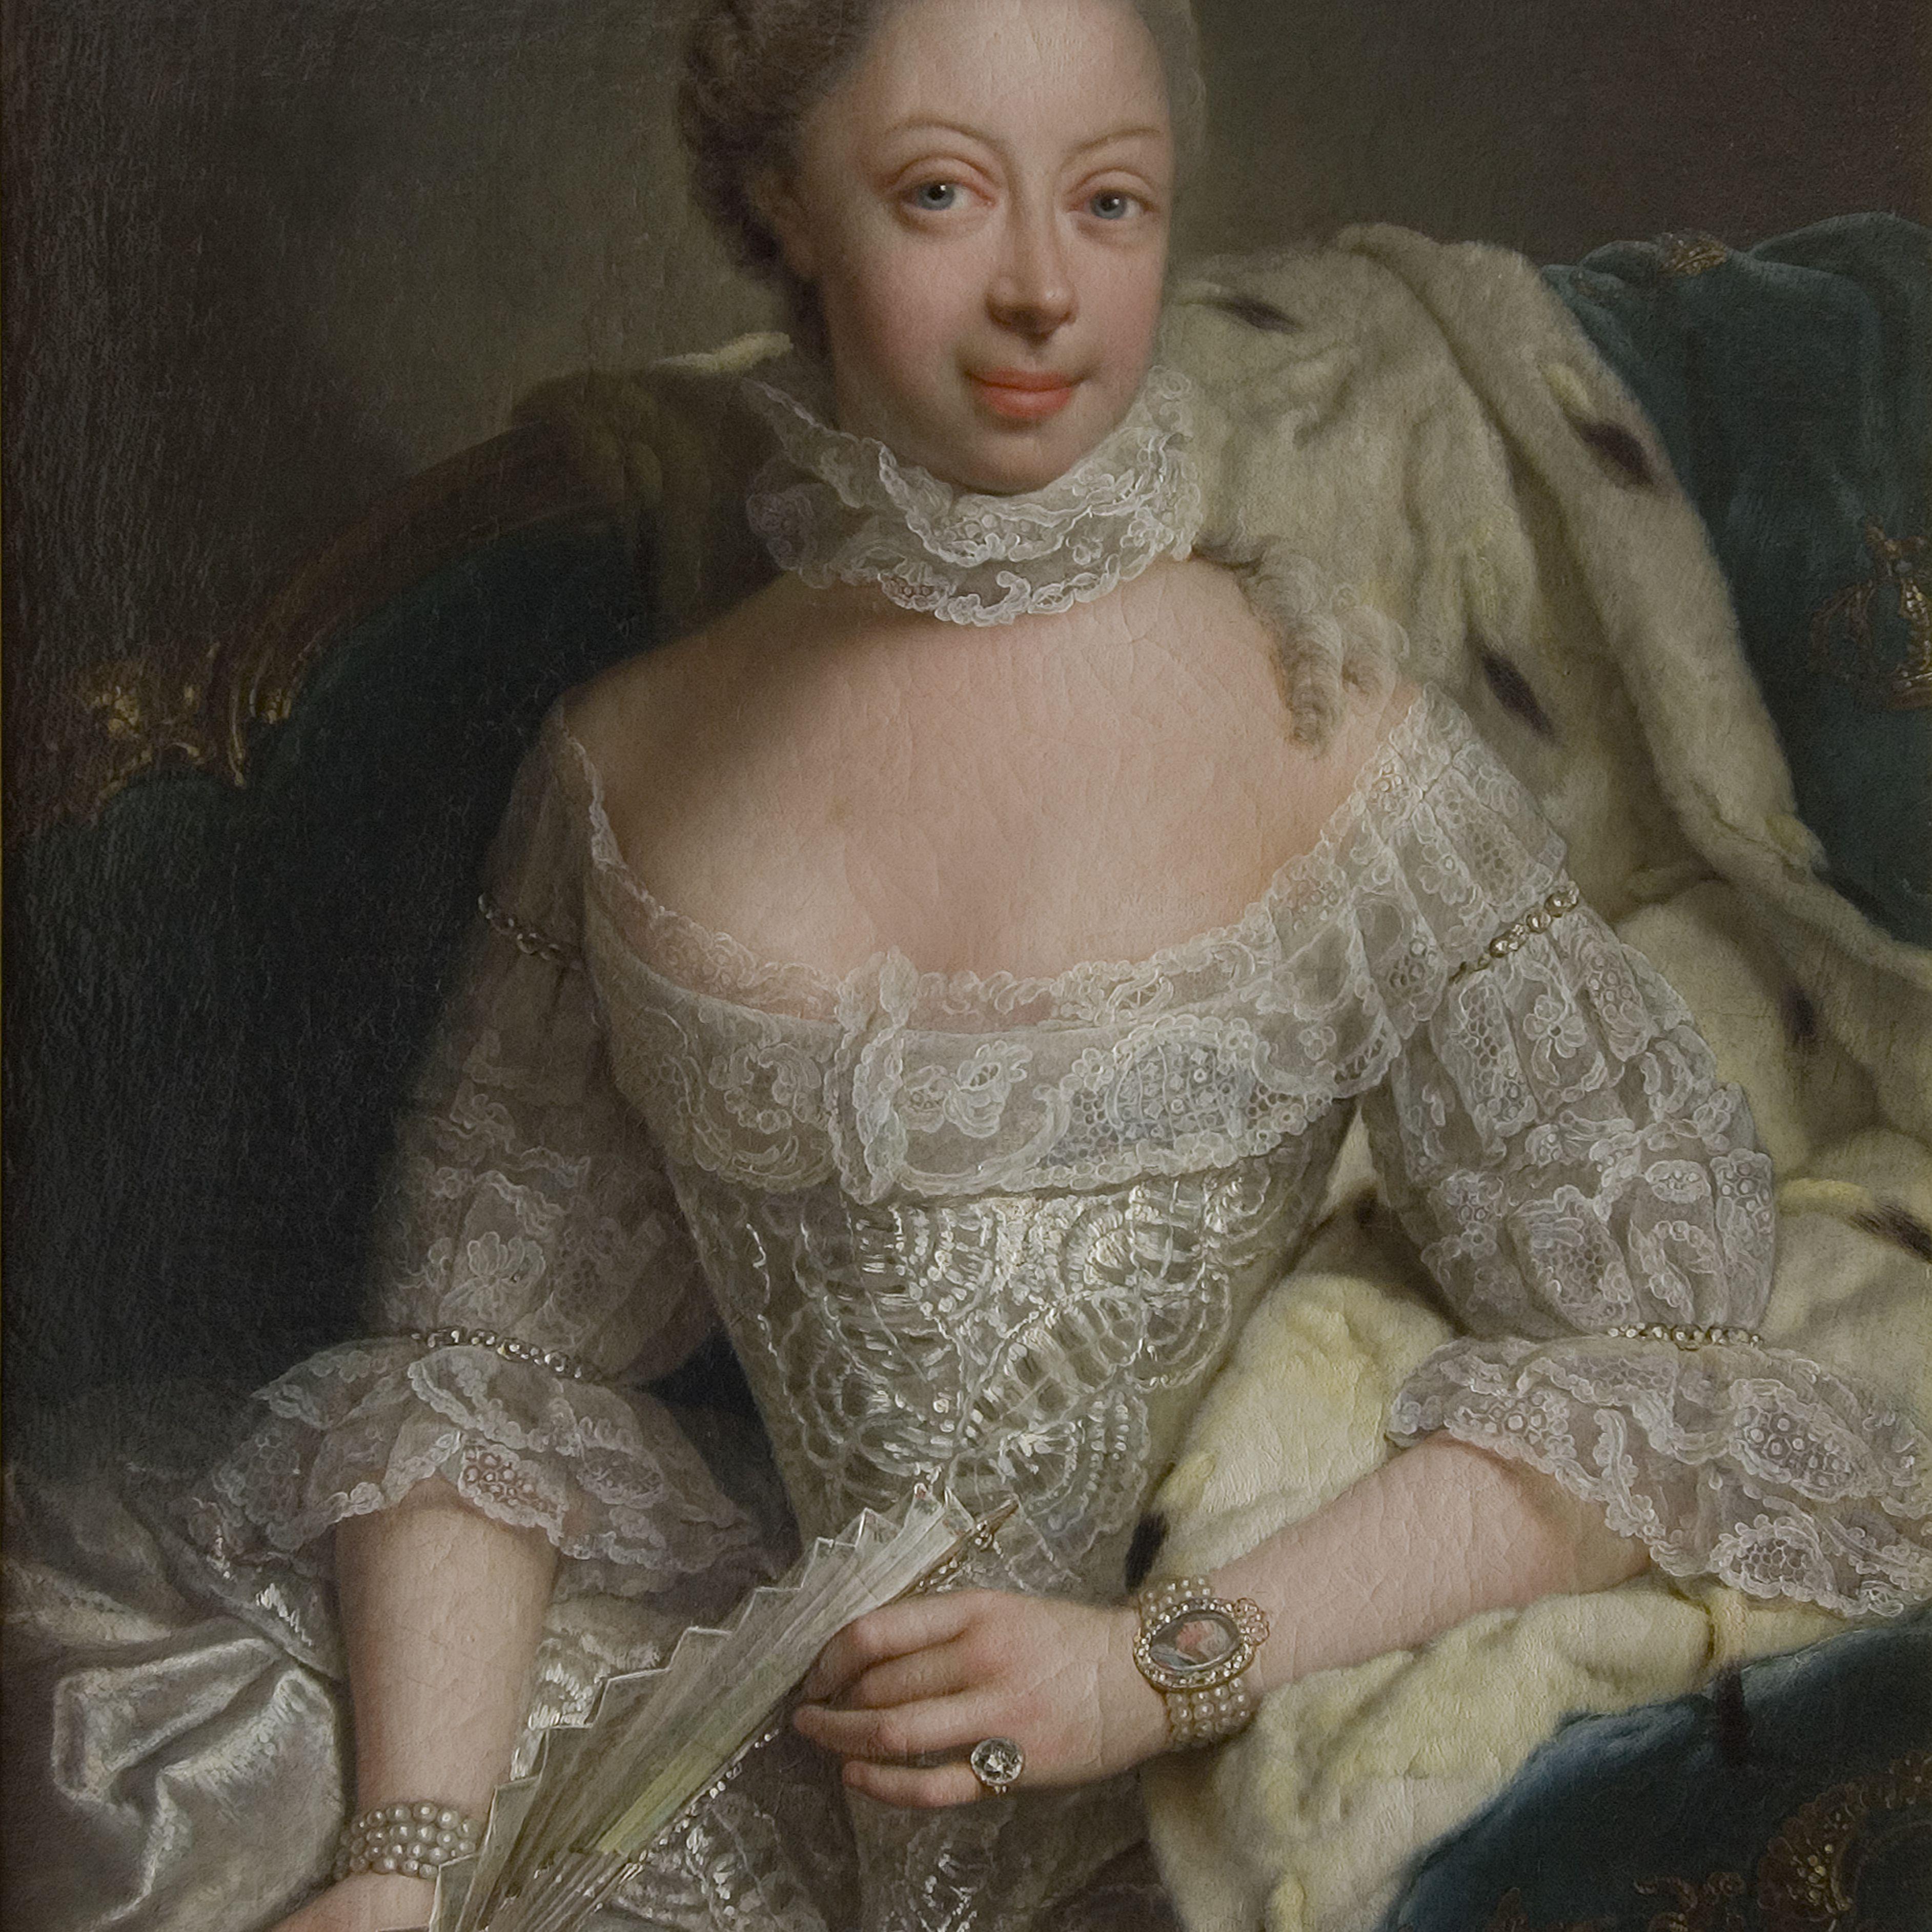 Portrait Of Princess Charlotte Of Mecklenburg-Strelitz (1744-1818)